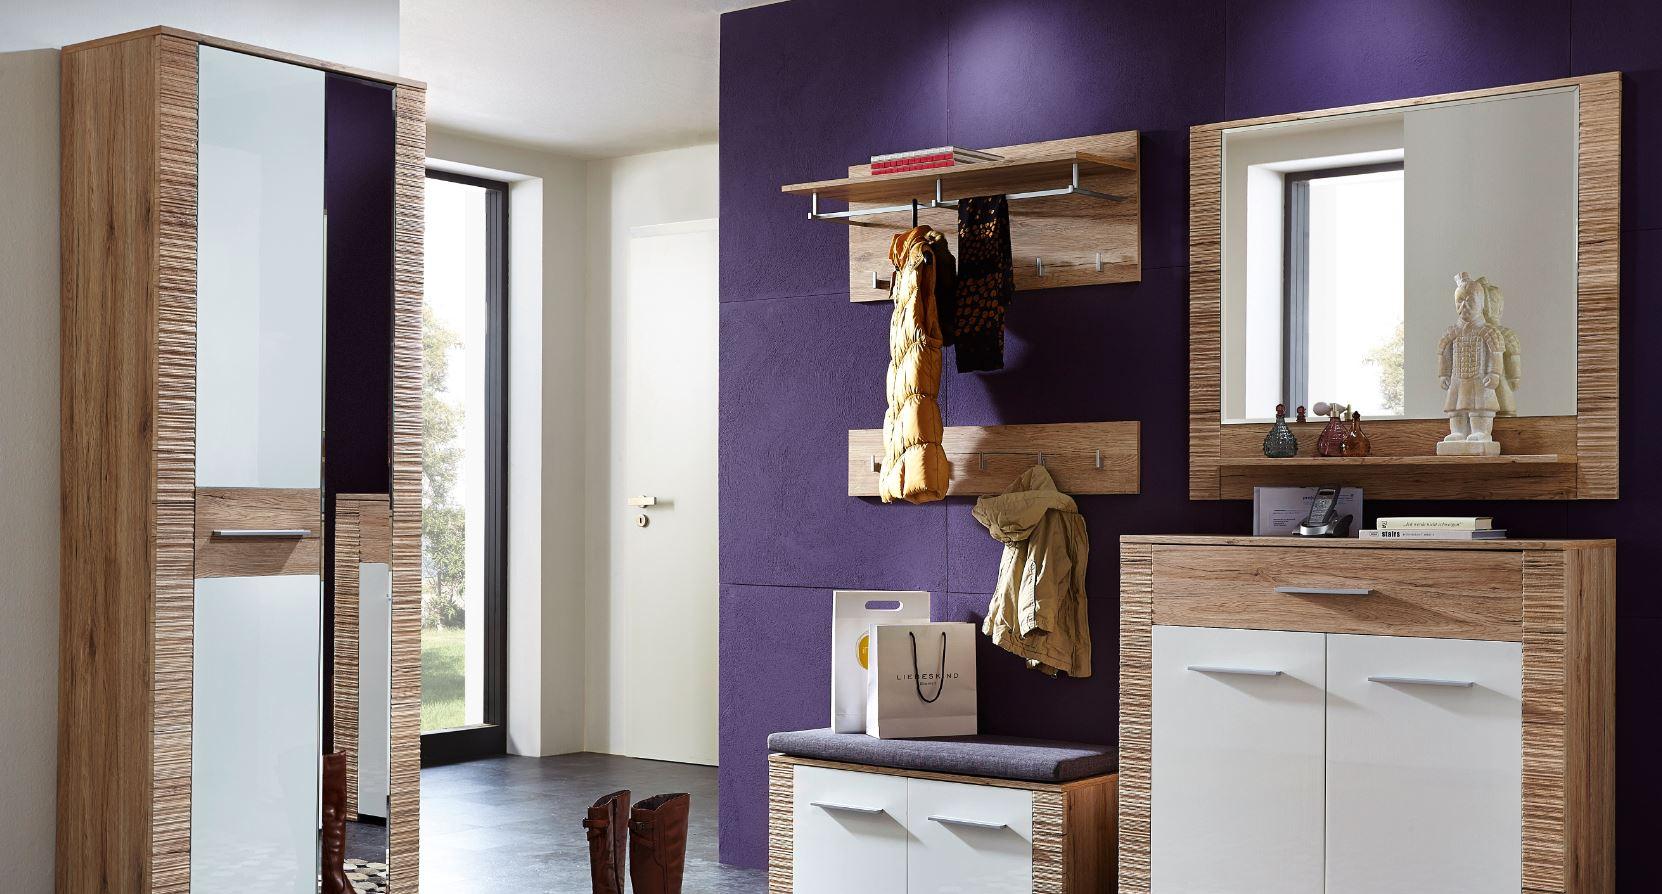 cleveland sitzbank san remo eiche hell dekor bank garderobenbank schuhbank diele flur schuhb nke. Black Bedroom Furniture Sets. Home Design Ideas